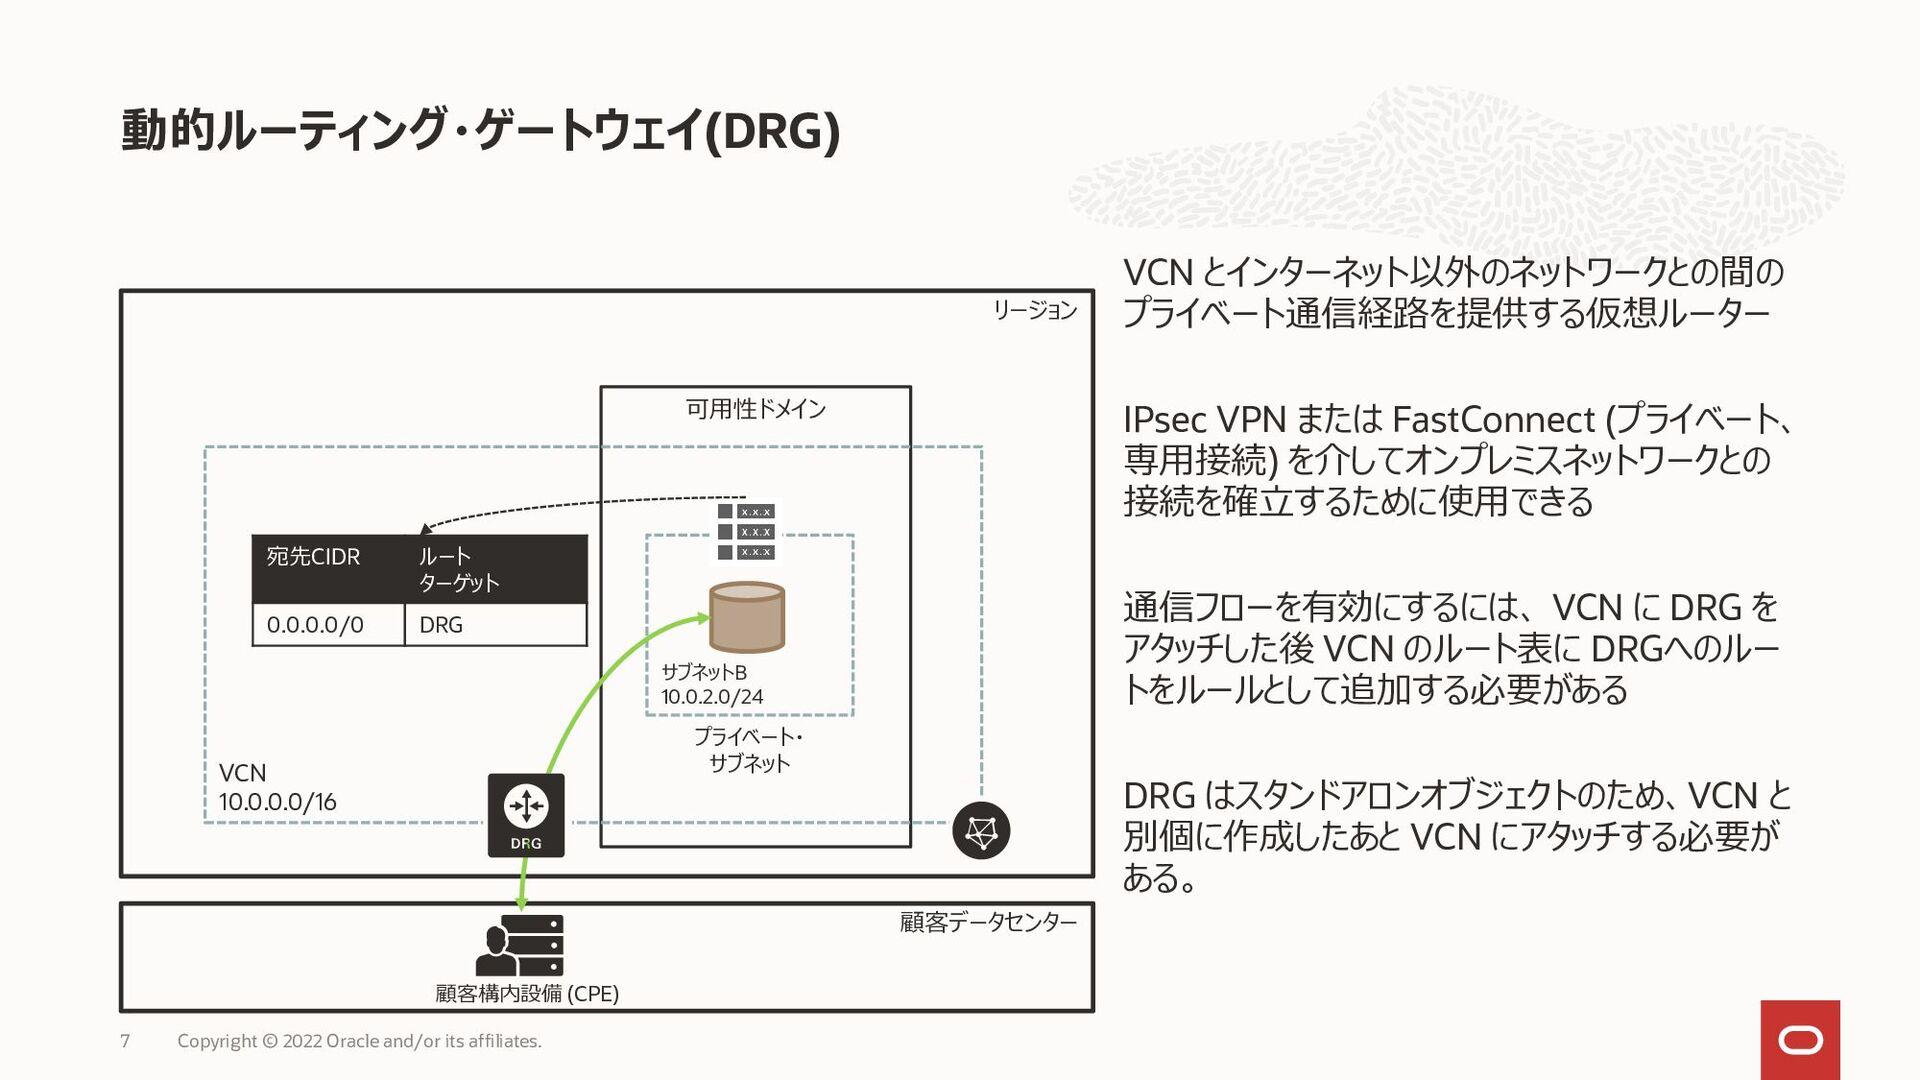 VCN IPsec VPN FastConnect ( ) 翻 VCN DRG VCN DRG...